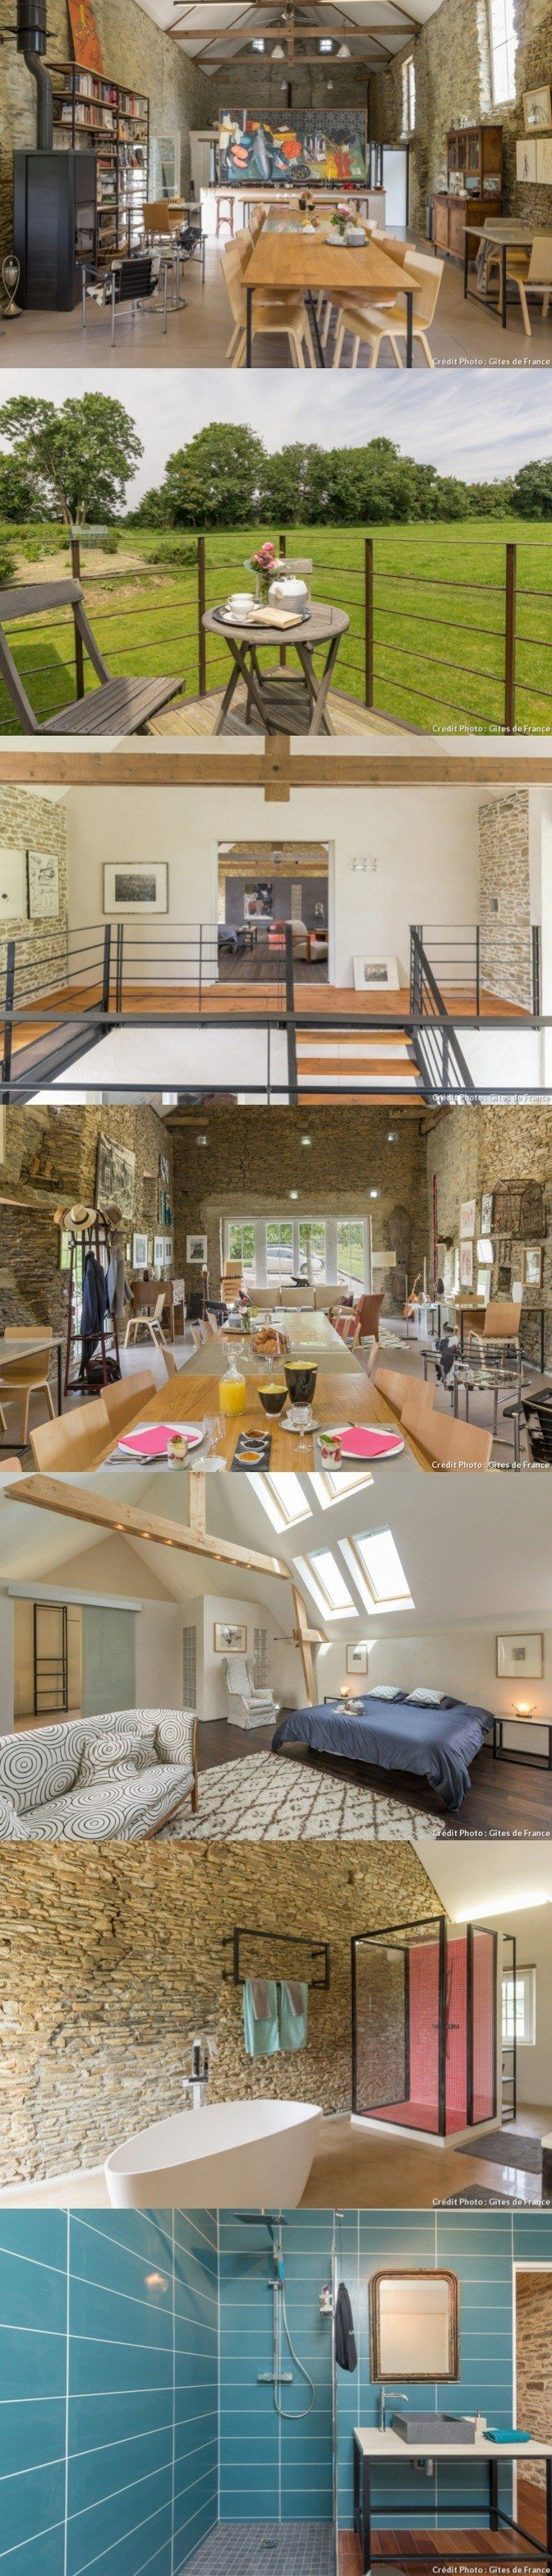 Fascinante diseño interior italiano / http://www.maisoncreative.com